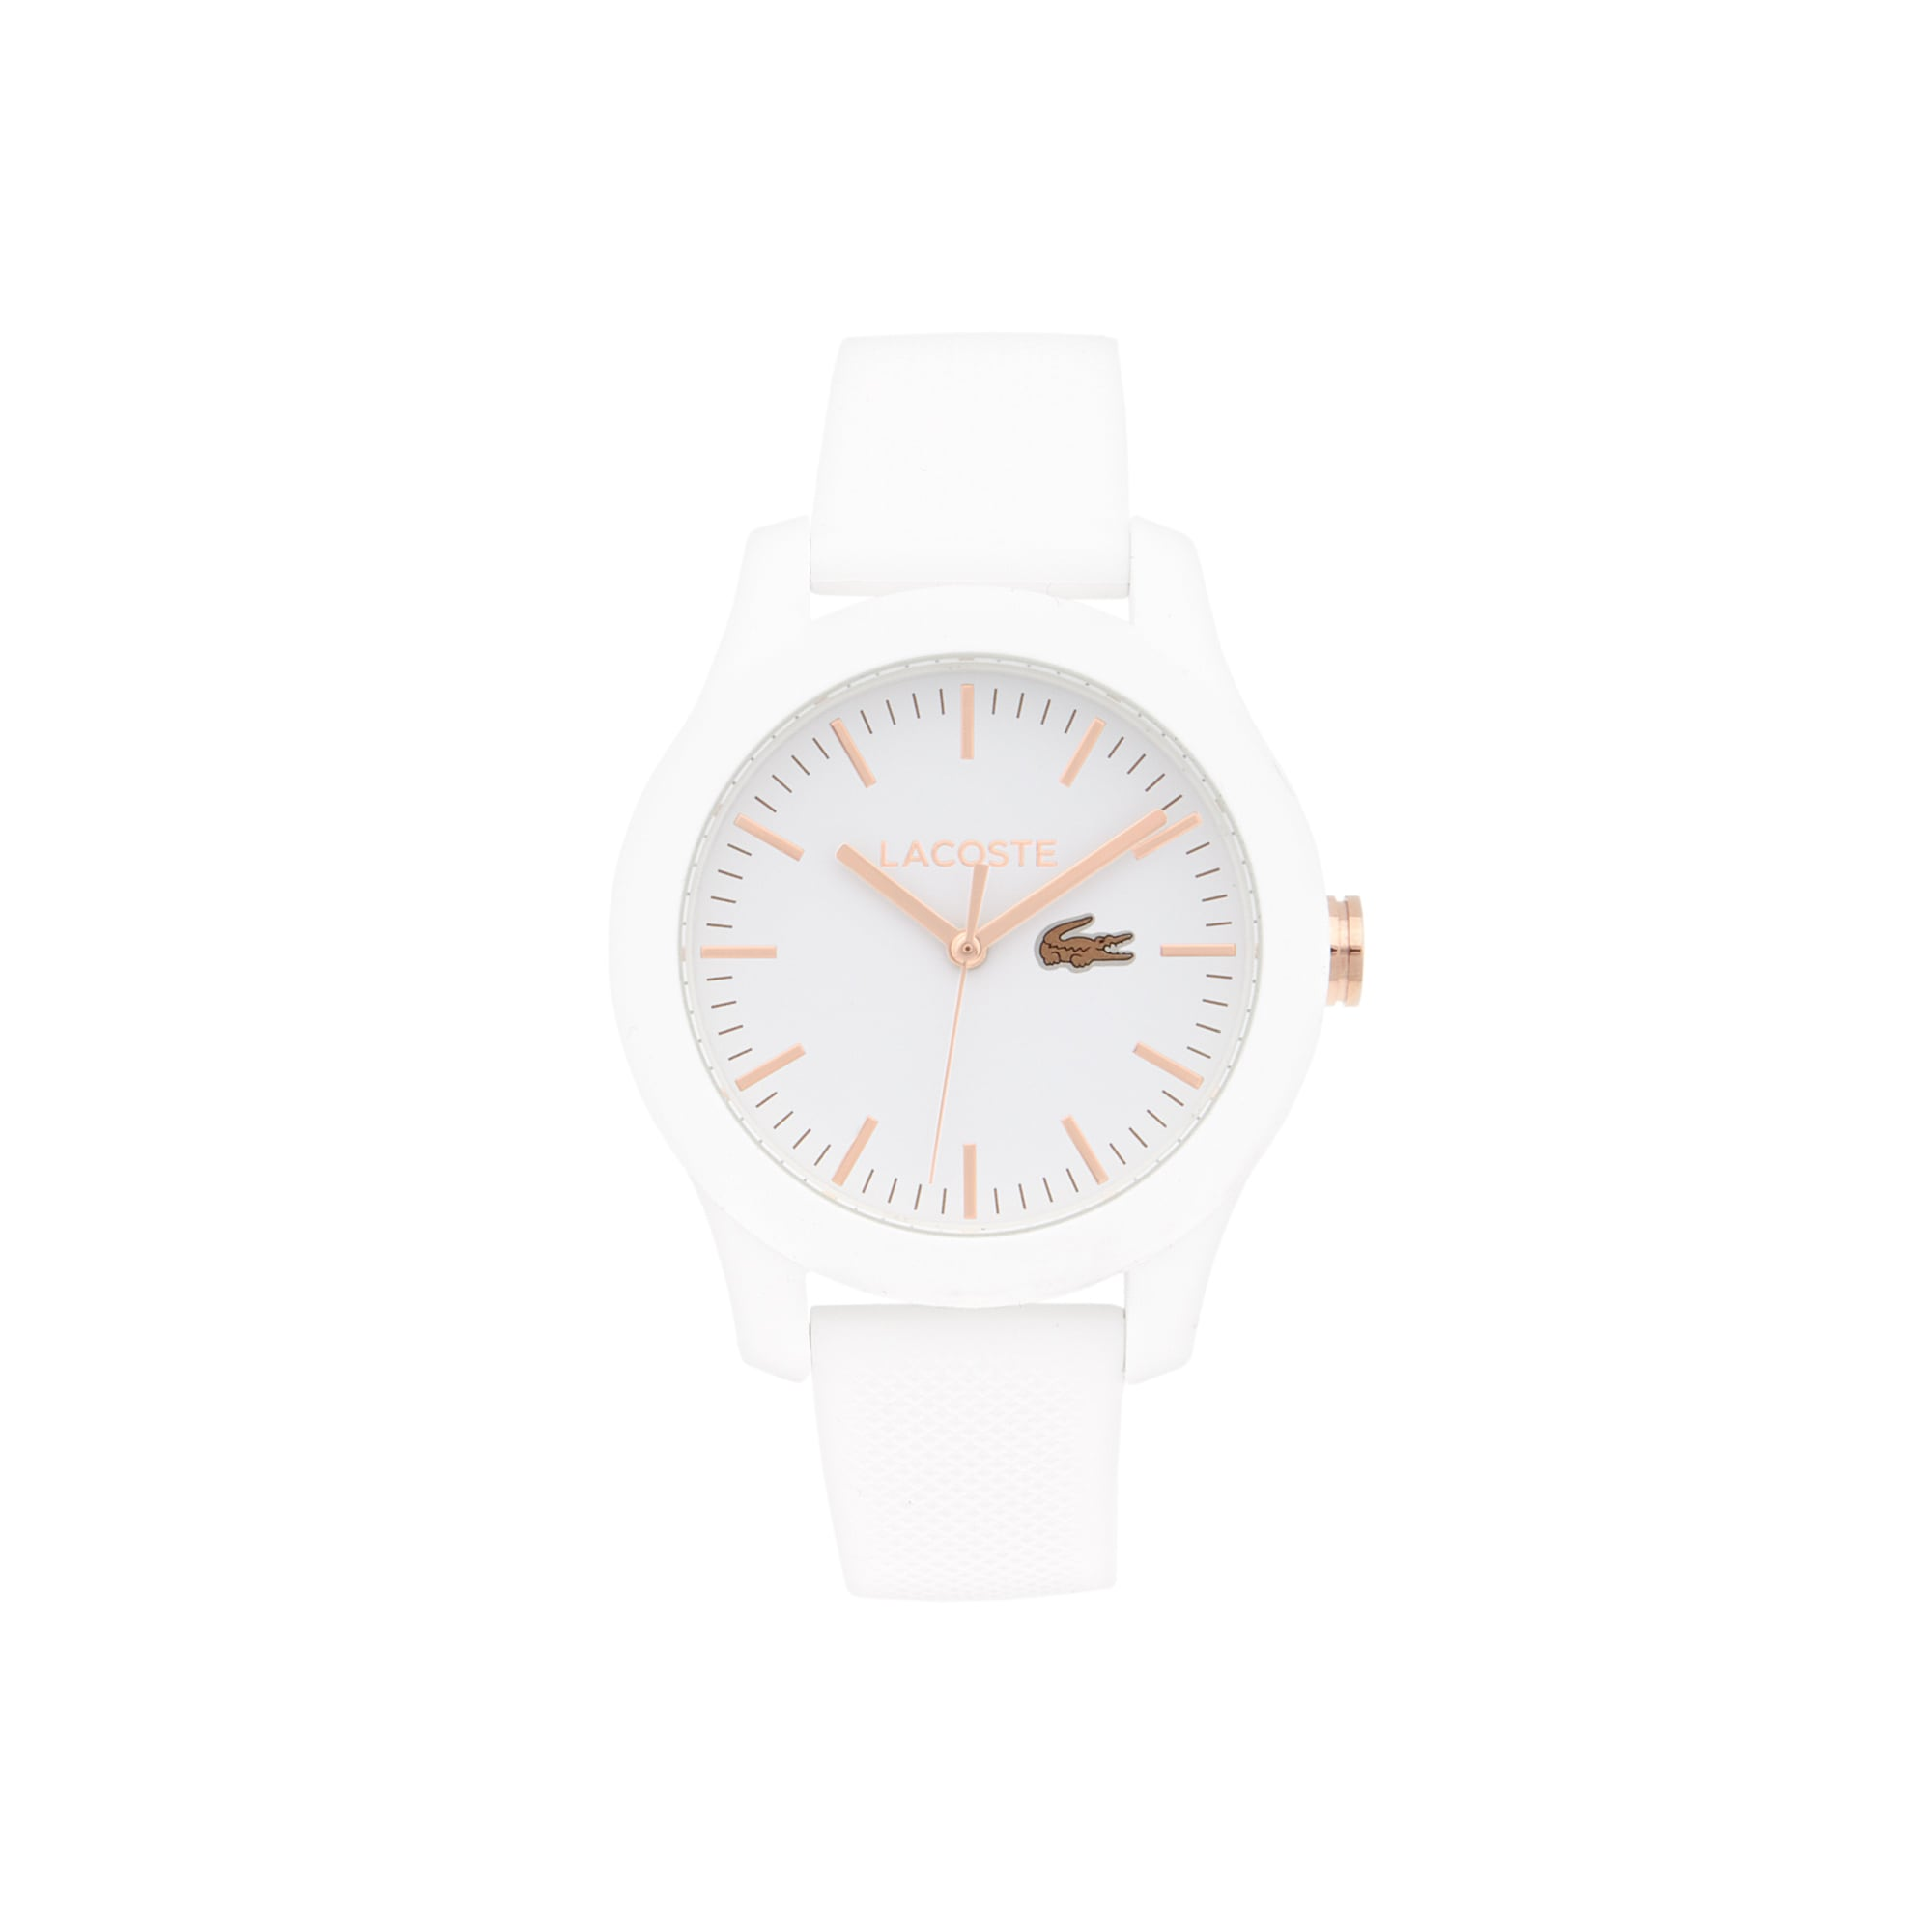 Relógio Lacoste 12.12 de mulher com bracelete de silicone branca